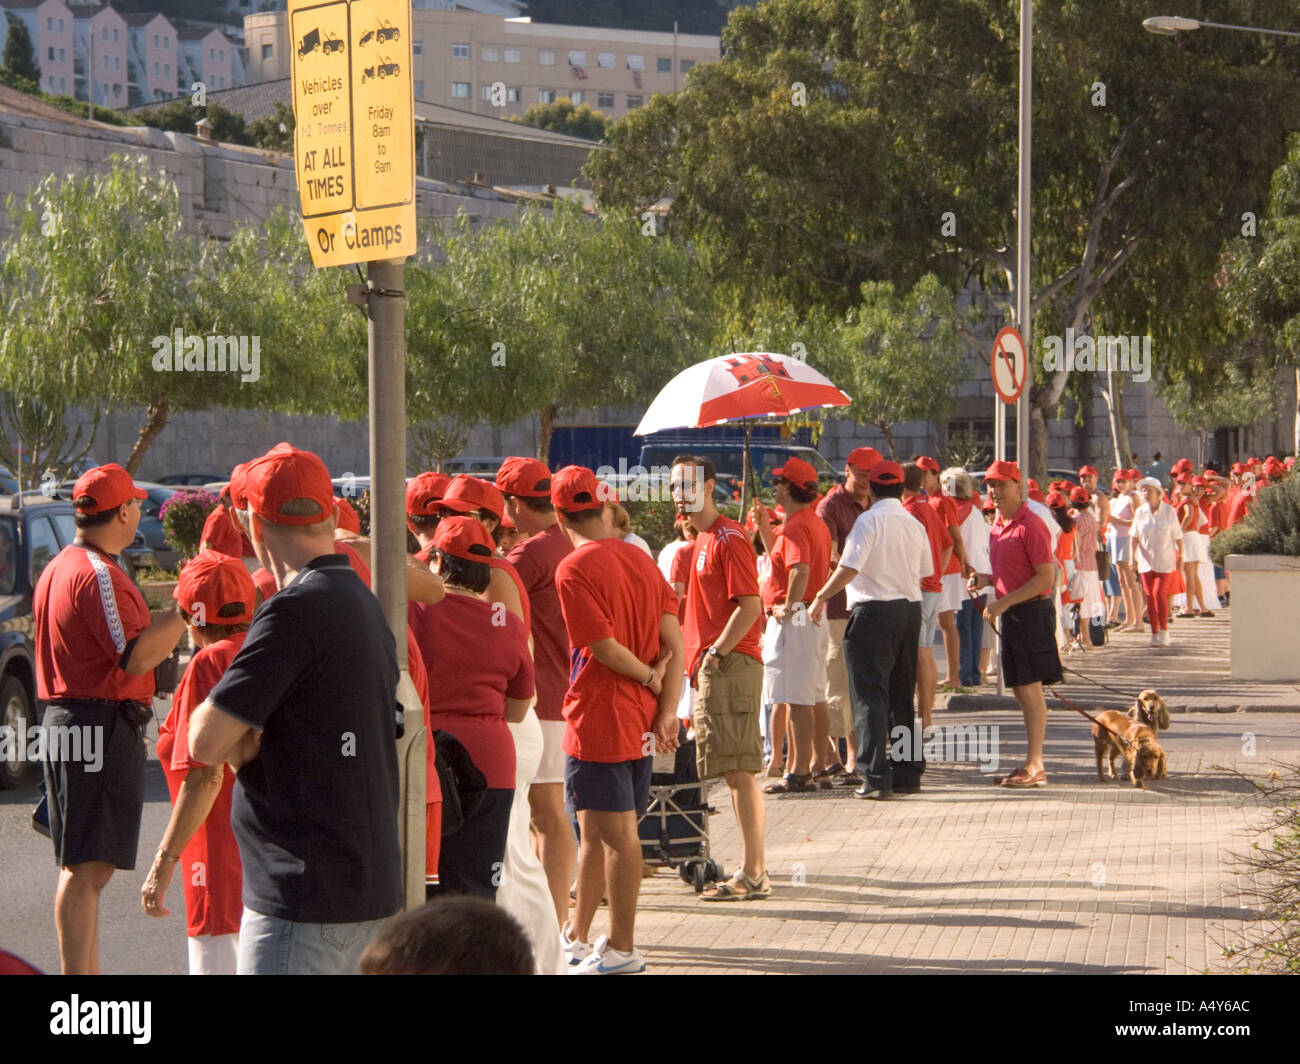 Gibraltar Tercentenary Celebrations human chain hold held link linked hands enjoy Gibraltar Tercentenary Celebrations - Stock Image